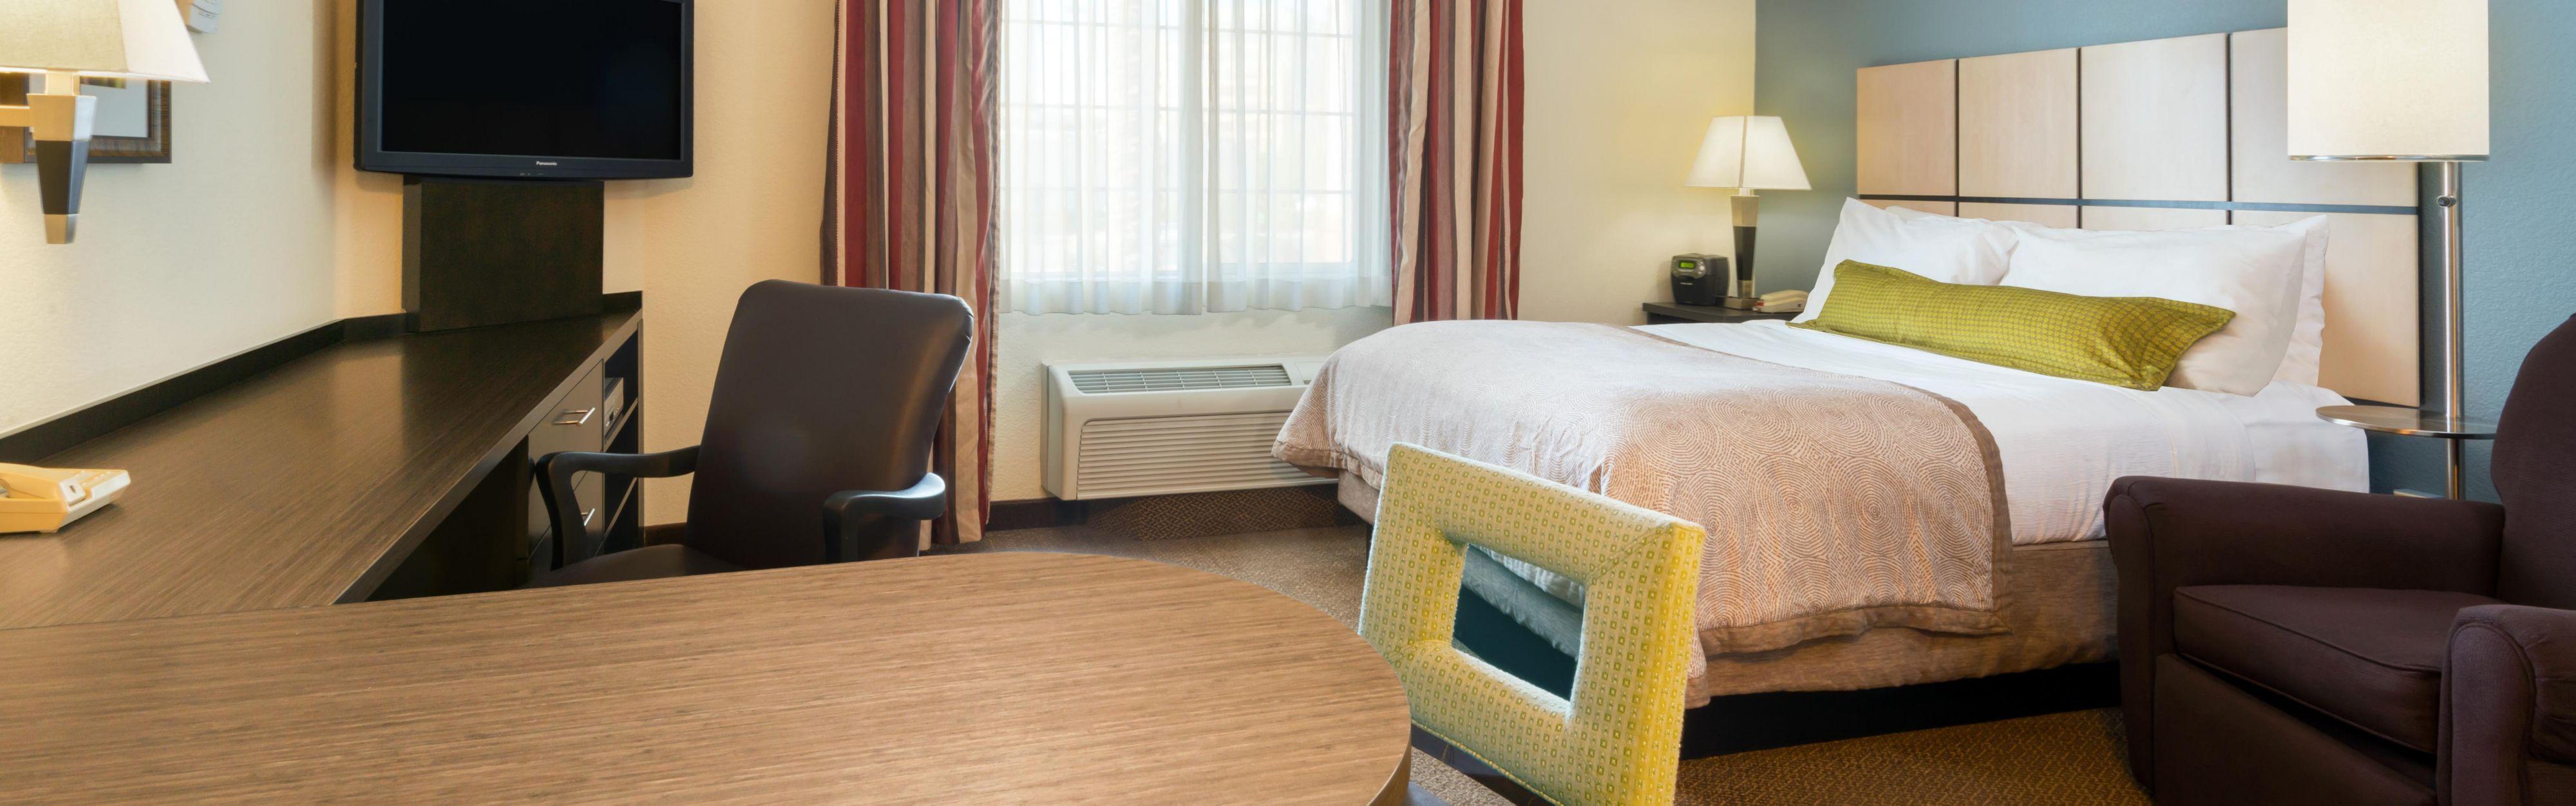 Candlewood Suites Detroit-Troy image 1